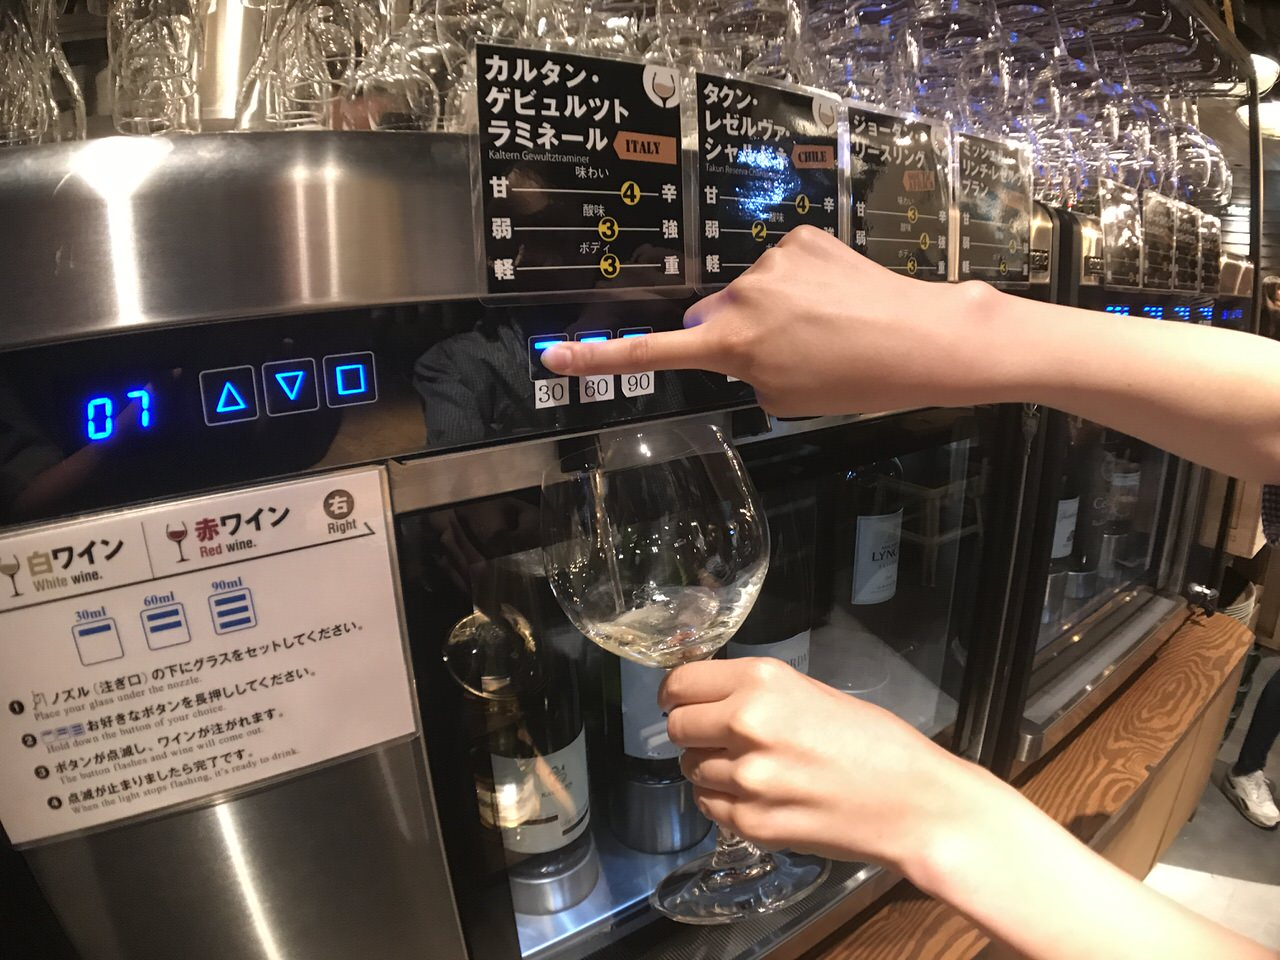 Shinjuku nishiguchi oyster bar 3199